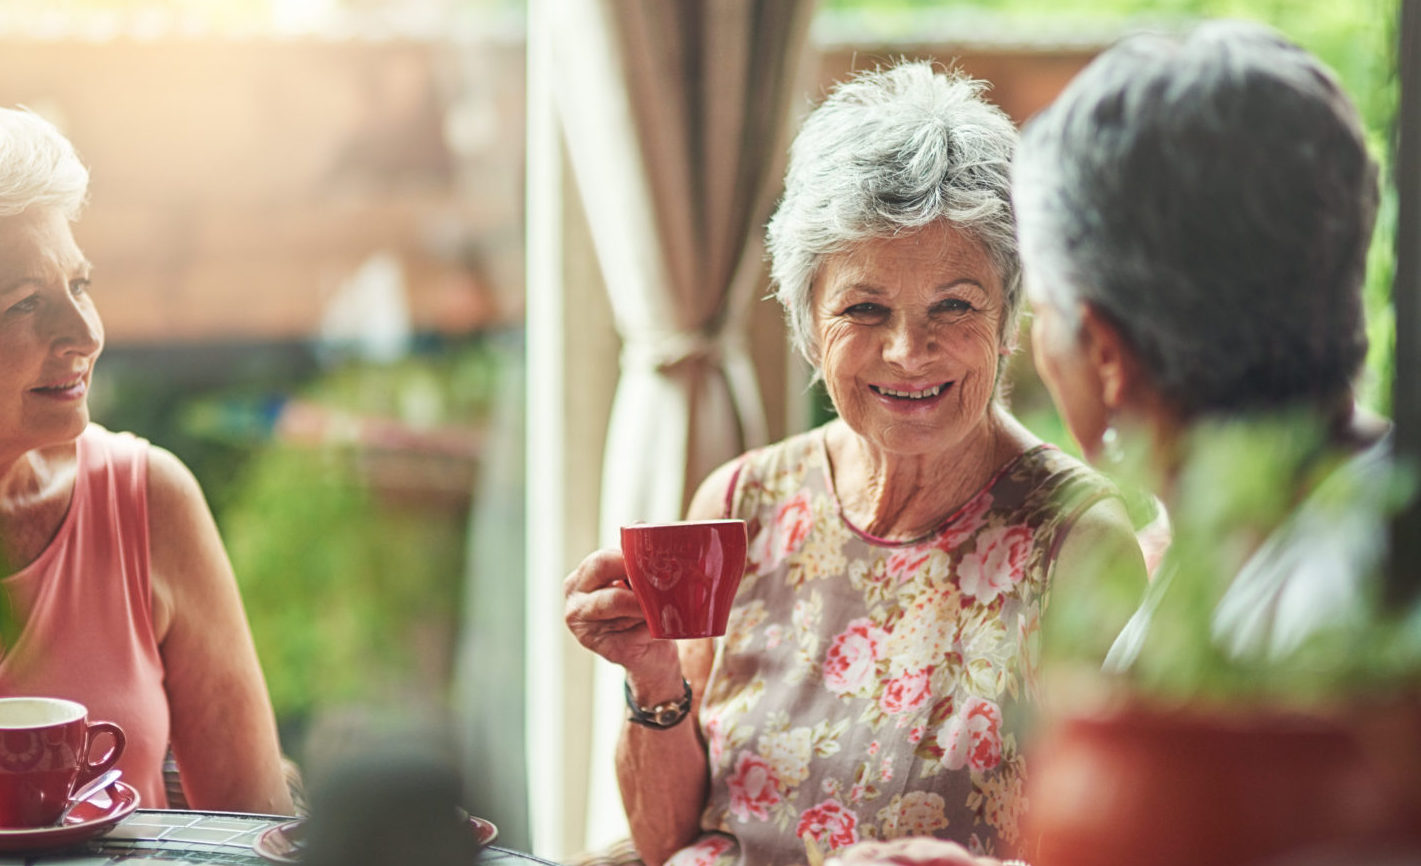 Aged Care Agency Melbourne - Ladies Enjoying Tea